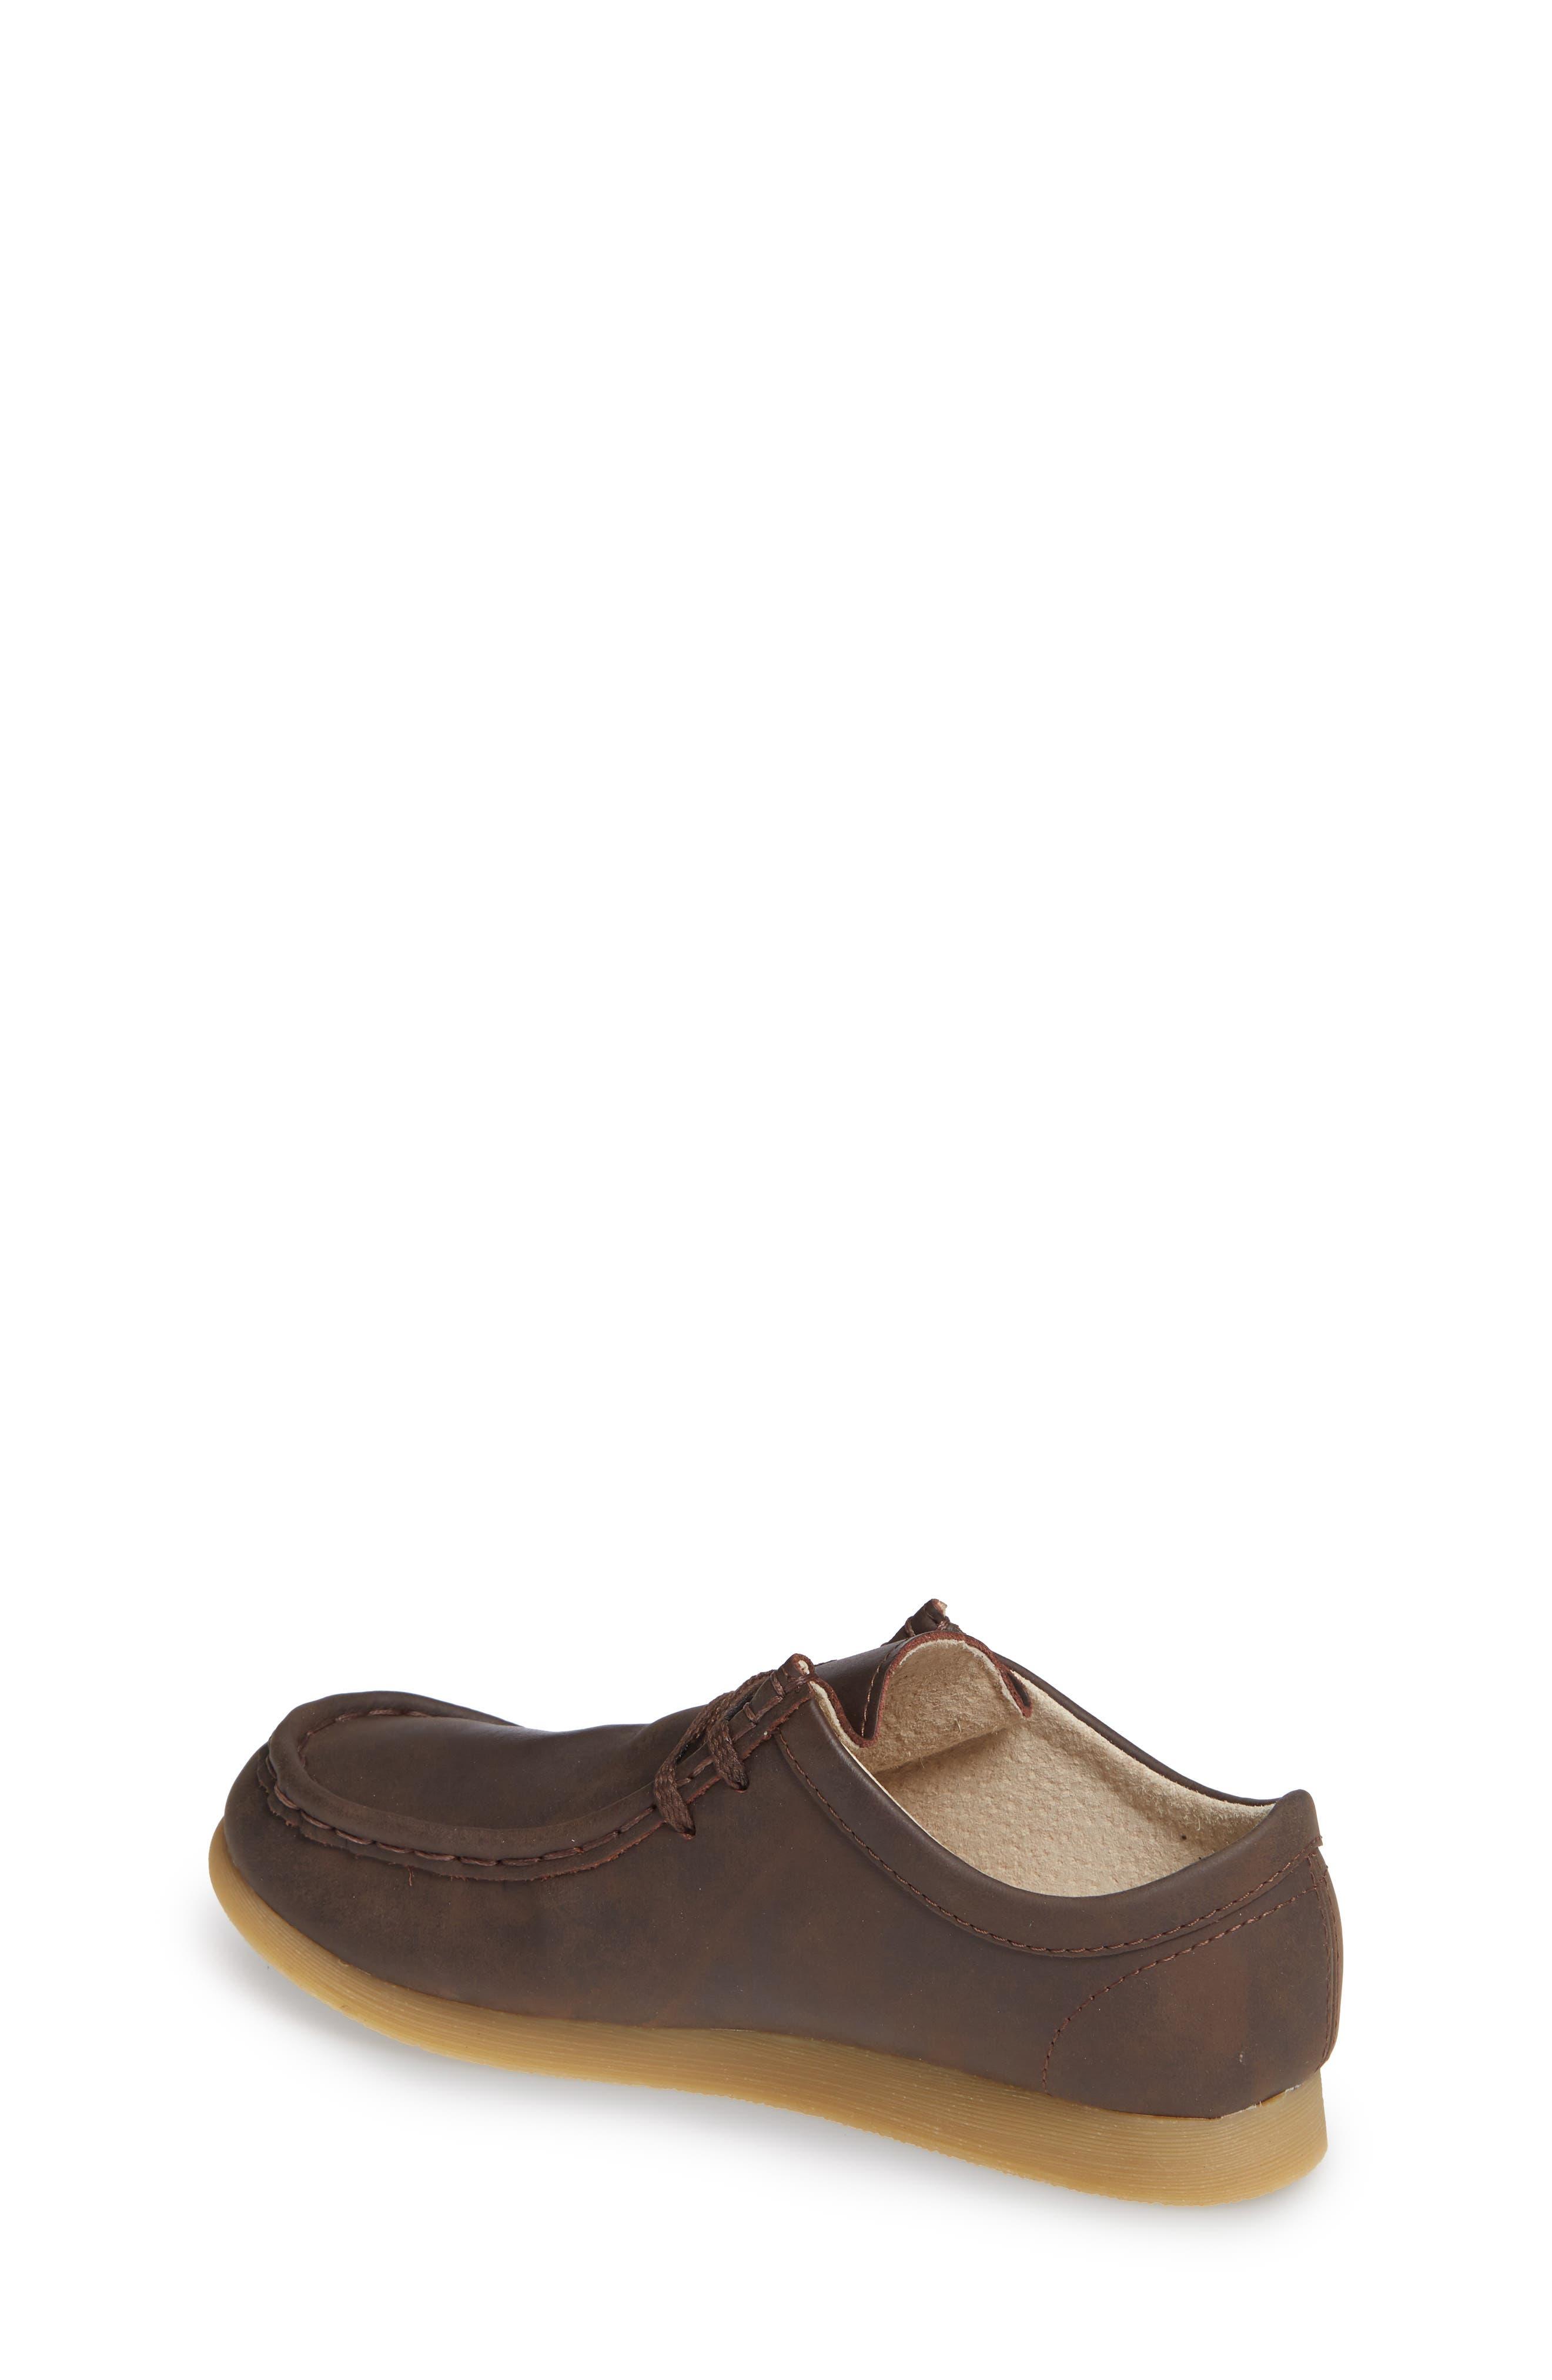 FOOTMATES, Wally Low Chukka Boot, Alternate thumbnail 2, color, BROWN OILED